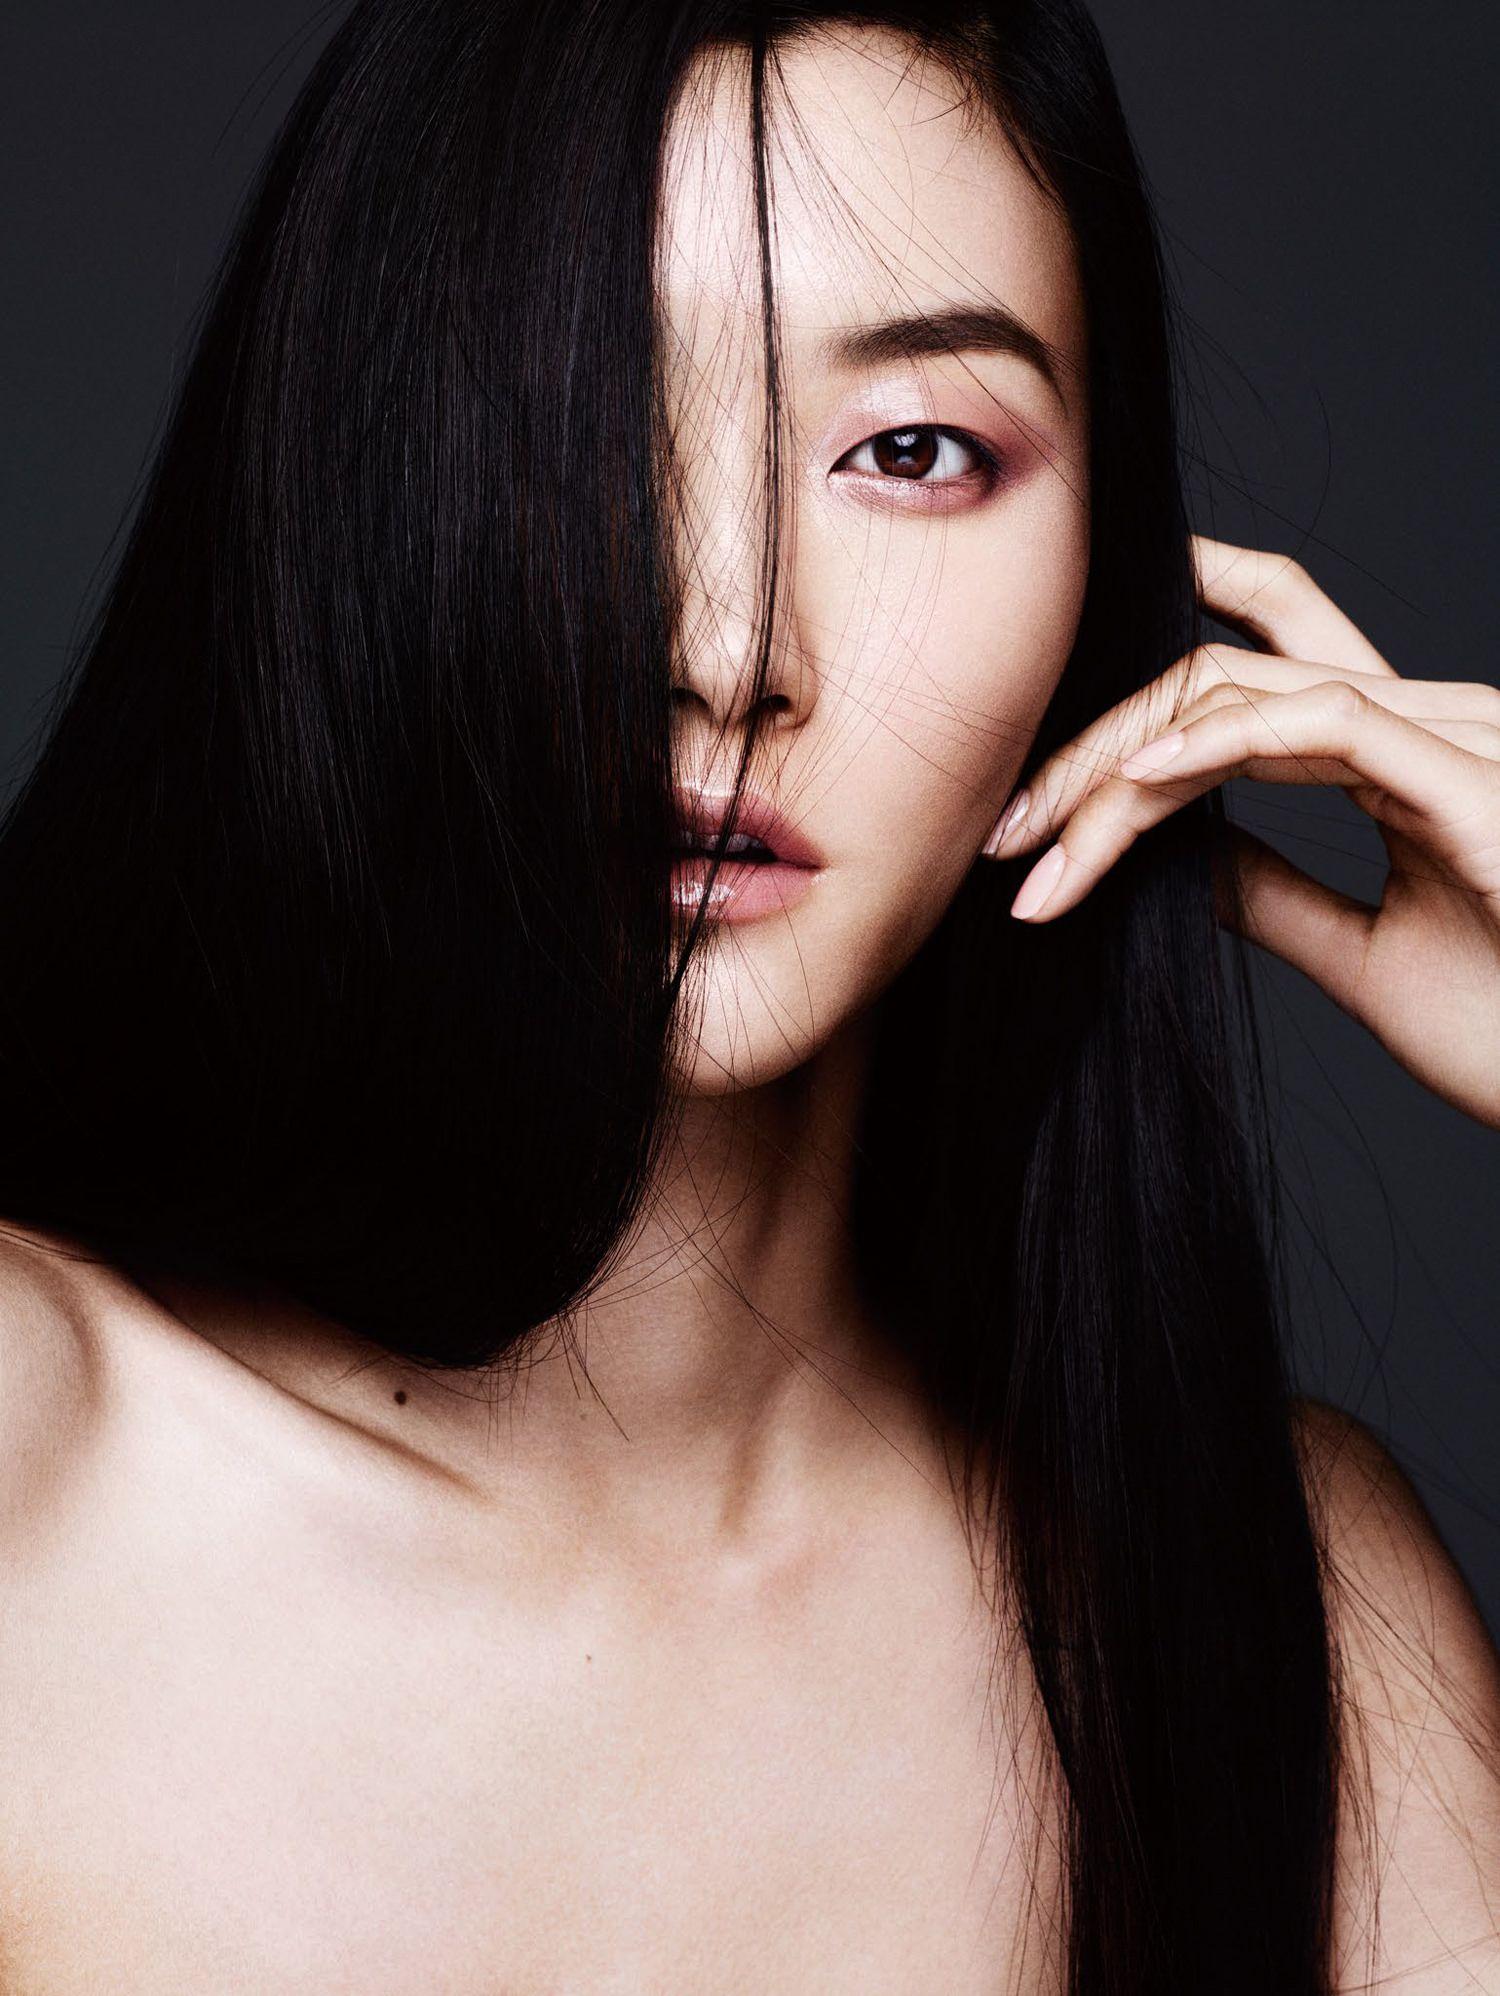 Pin by Jojo on Kawaii Vogue china, Beauty model, Baby face